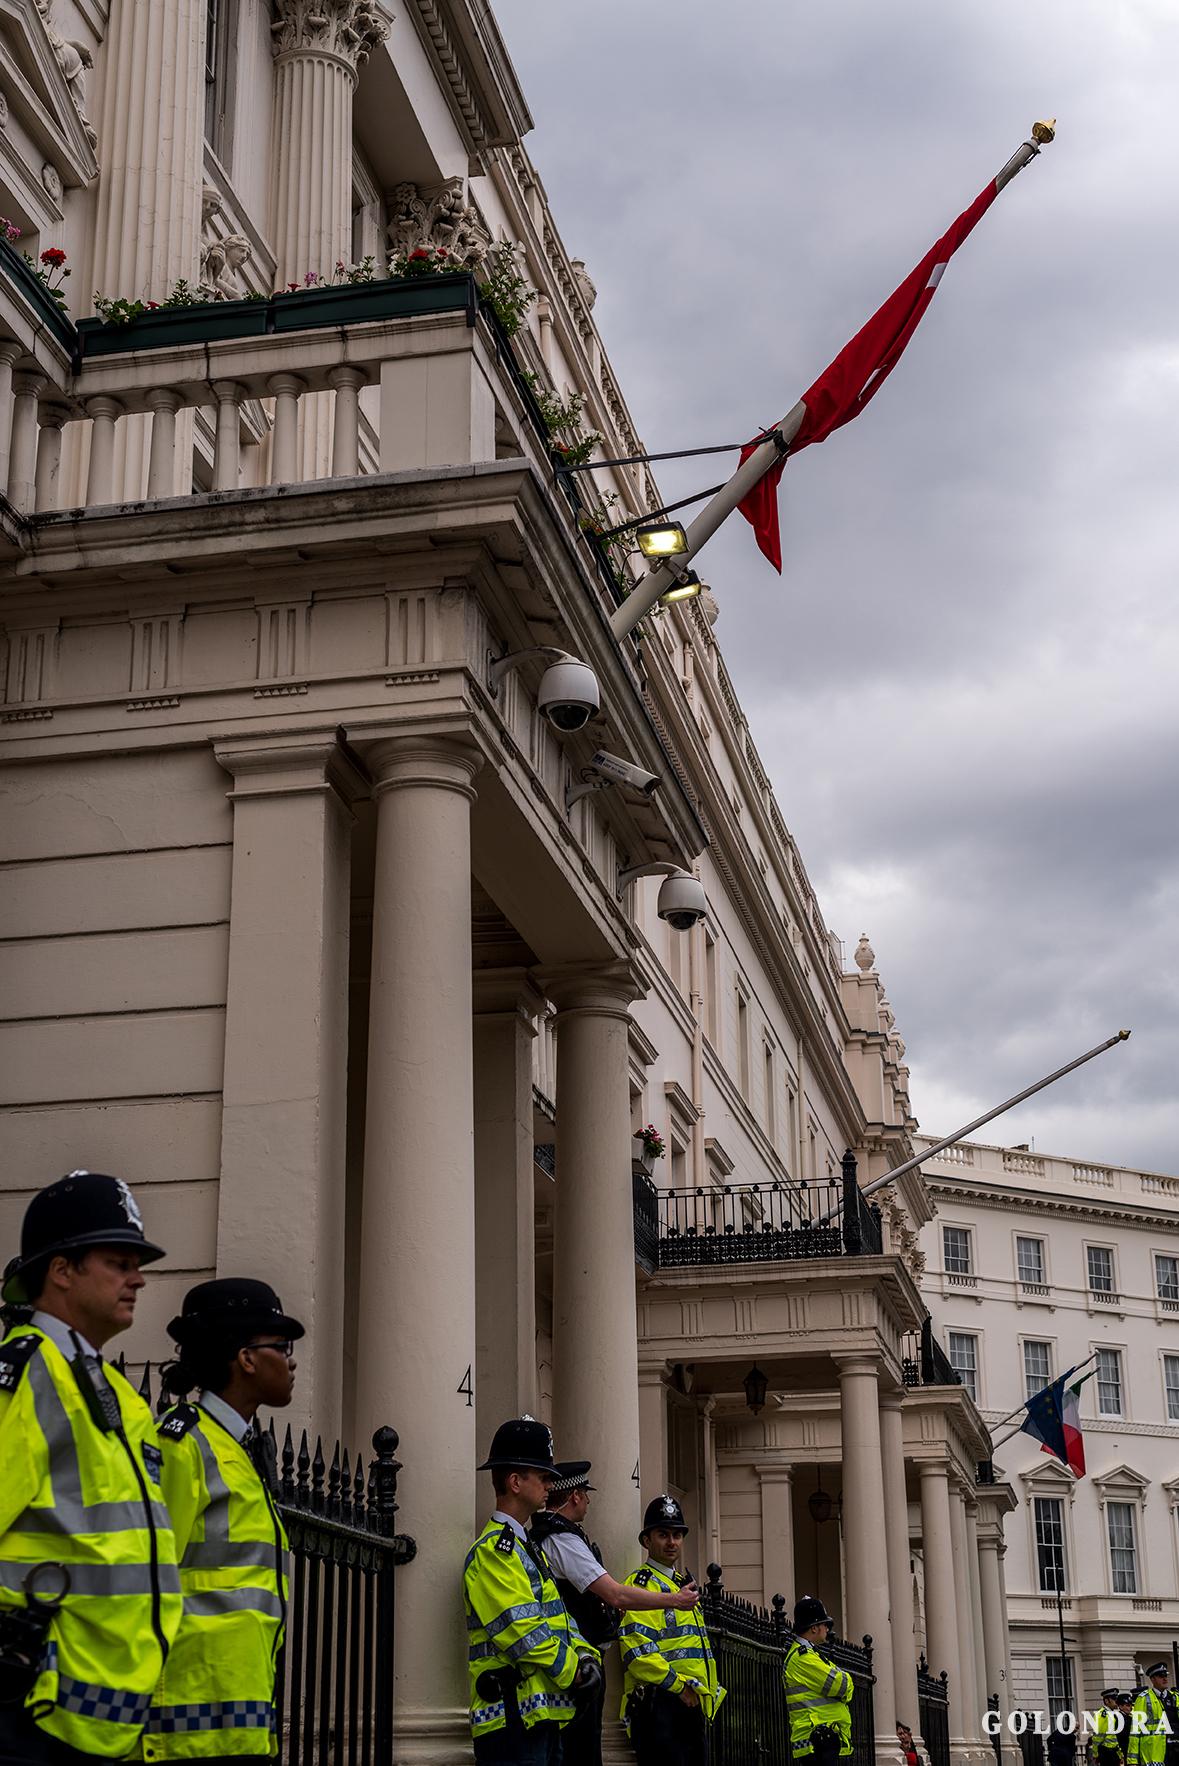 Protesting Turkish Government - Turk Hukumetini Protesto - Londra - London (44)